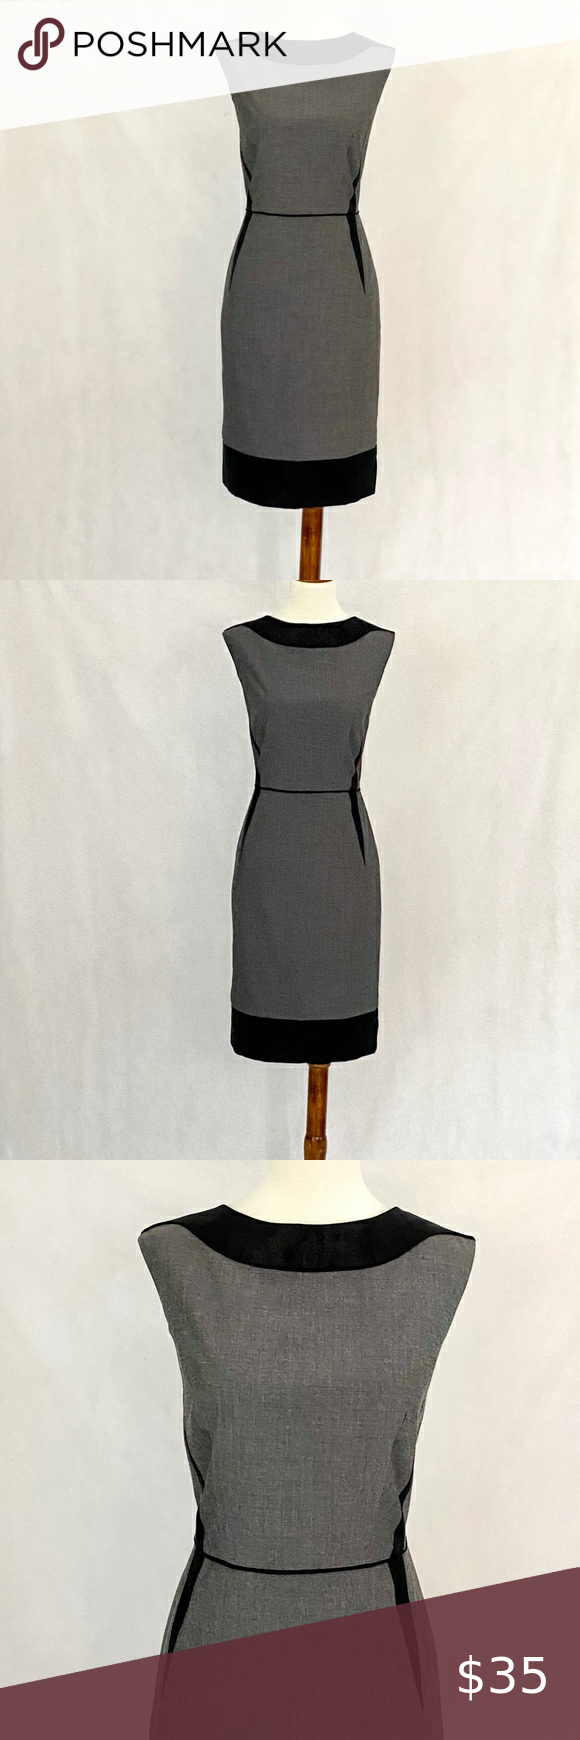 Tahari For Bloomingdale S Sleeveless Sheath Dress Sleeveless Sheath Dress Tahari Slim Fit Skirts [ 1740 x 580 Pixel ]